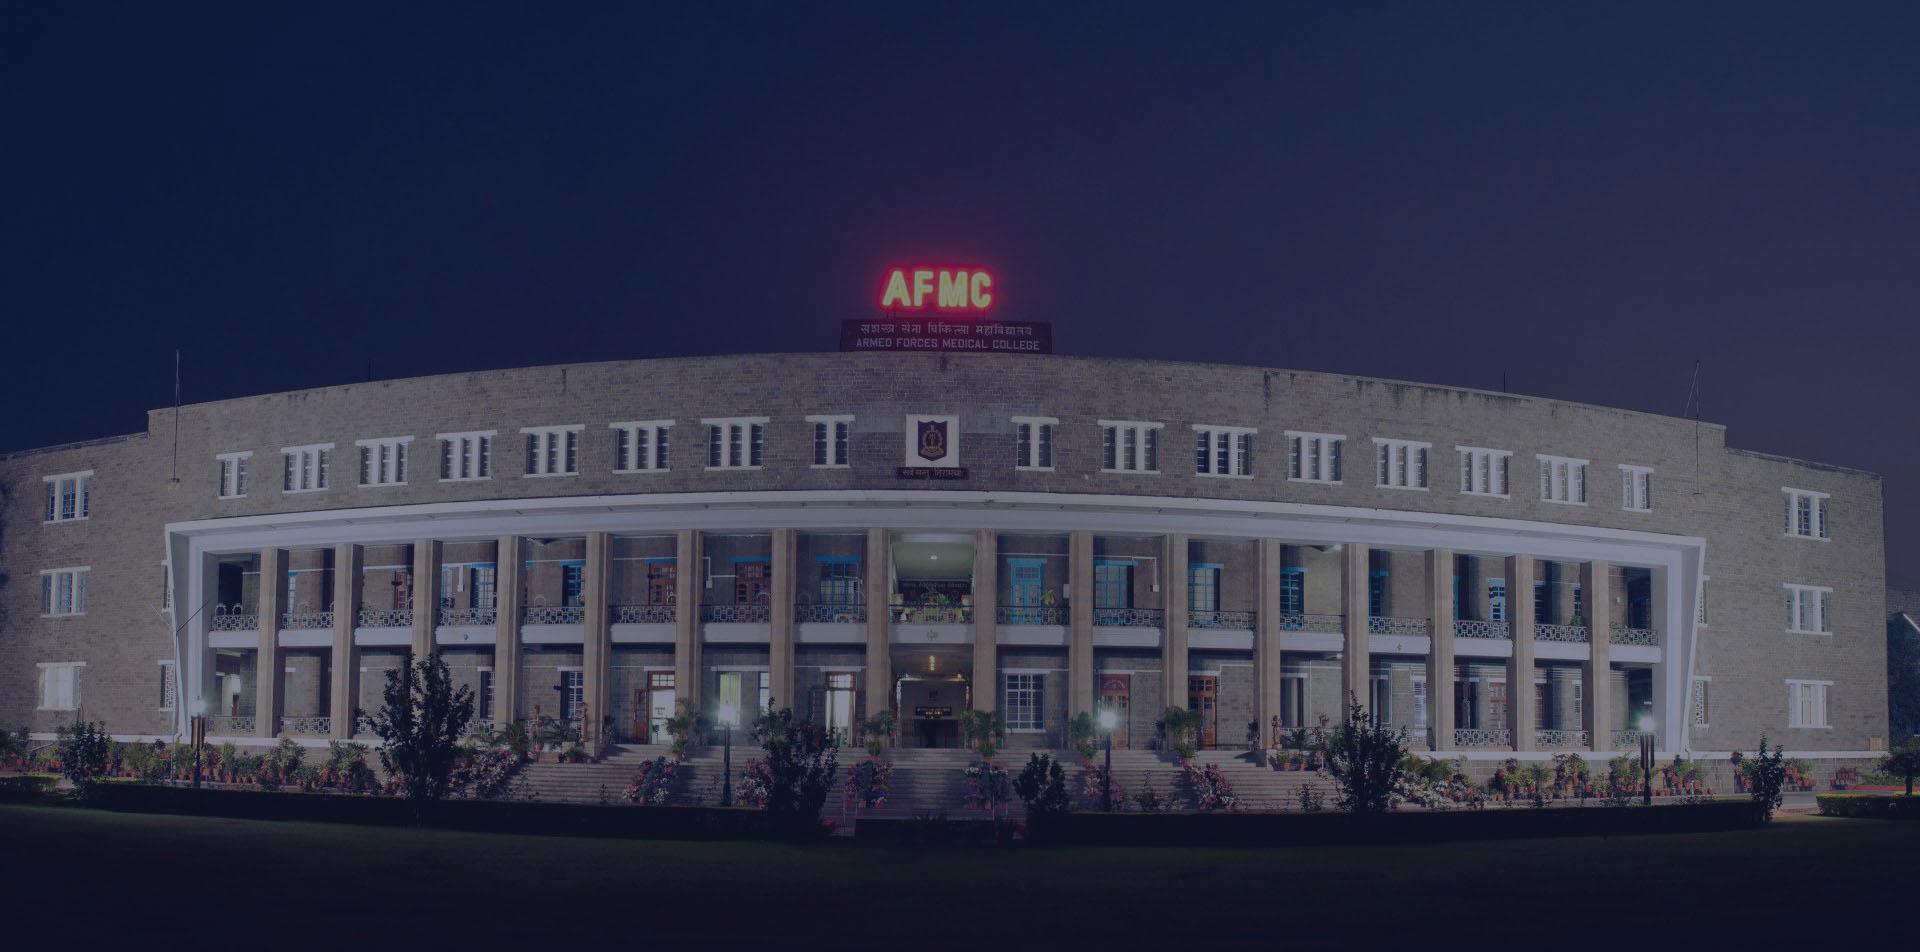 AFMC Exam 2019 selection process, AFMC Exam 2019 Eligibility Criteria, AFMC 2019 Selection procedure,Eligibility criteria of AFMC 2019,AFMC pune selection process